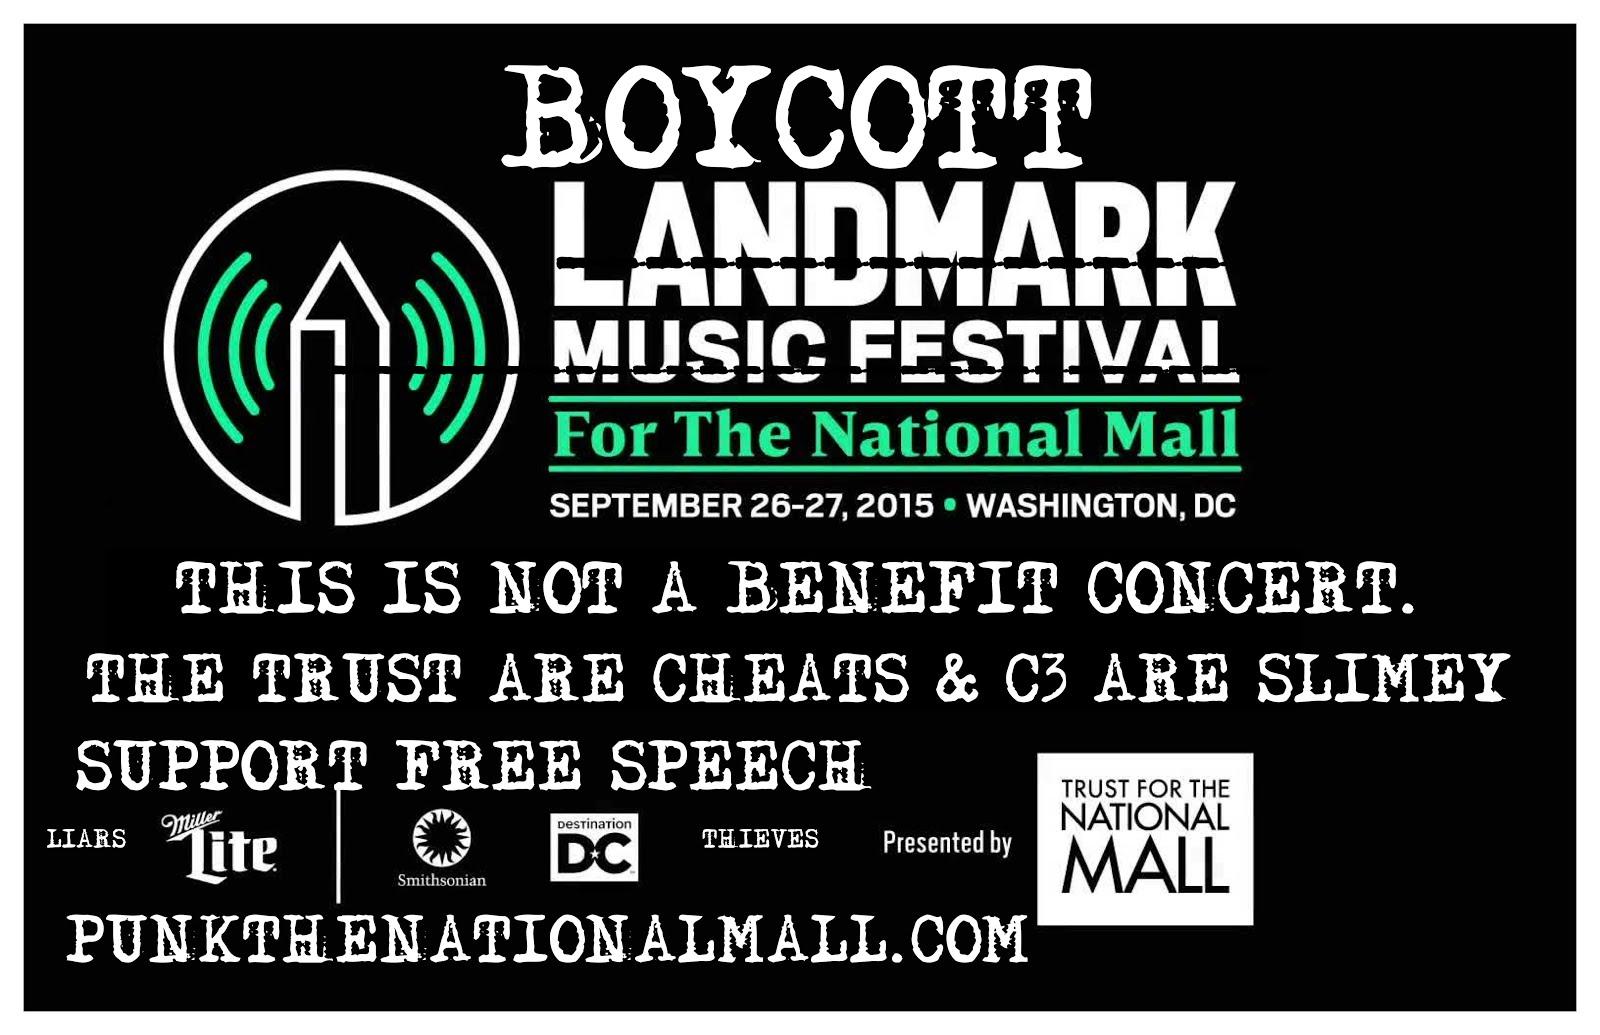 Boycott Landmark